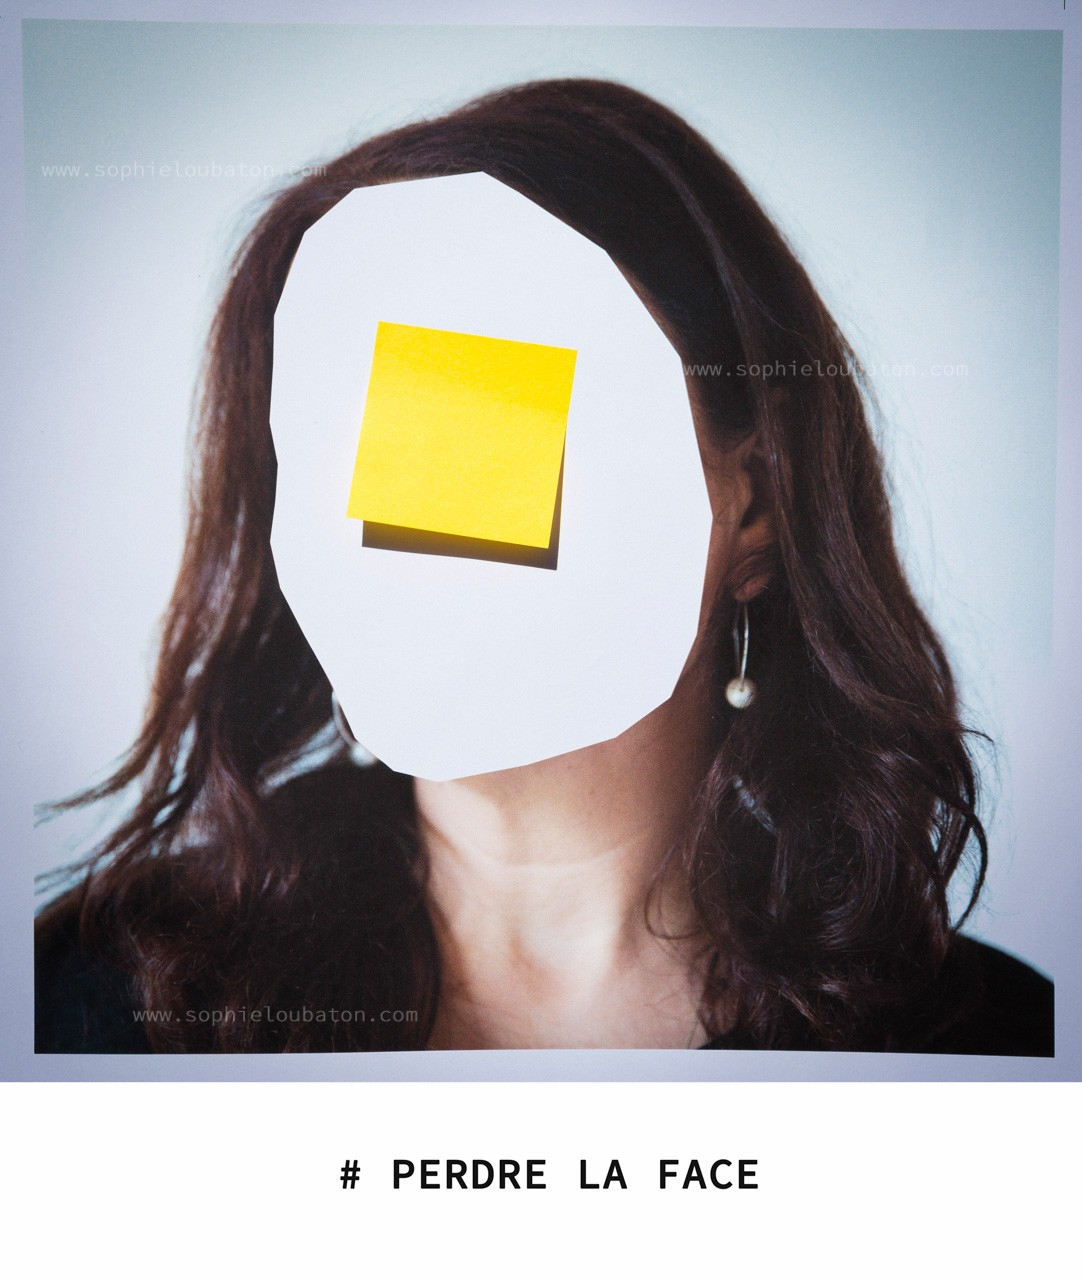 locutions : Perdre la face